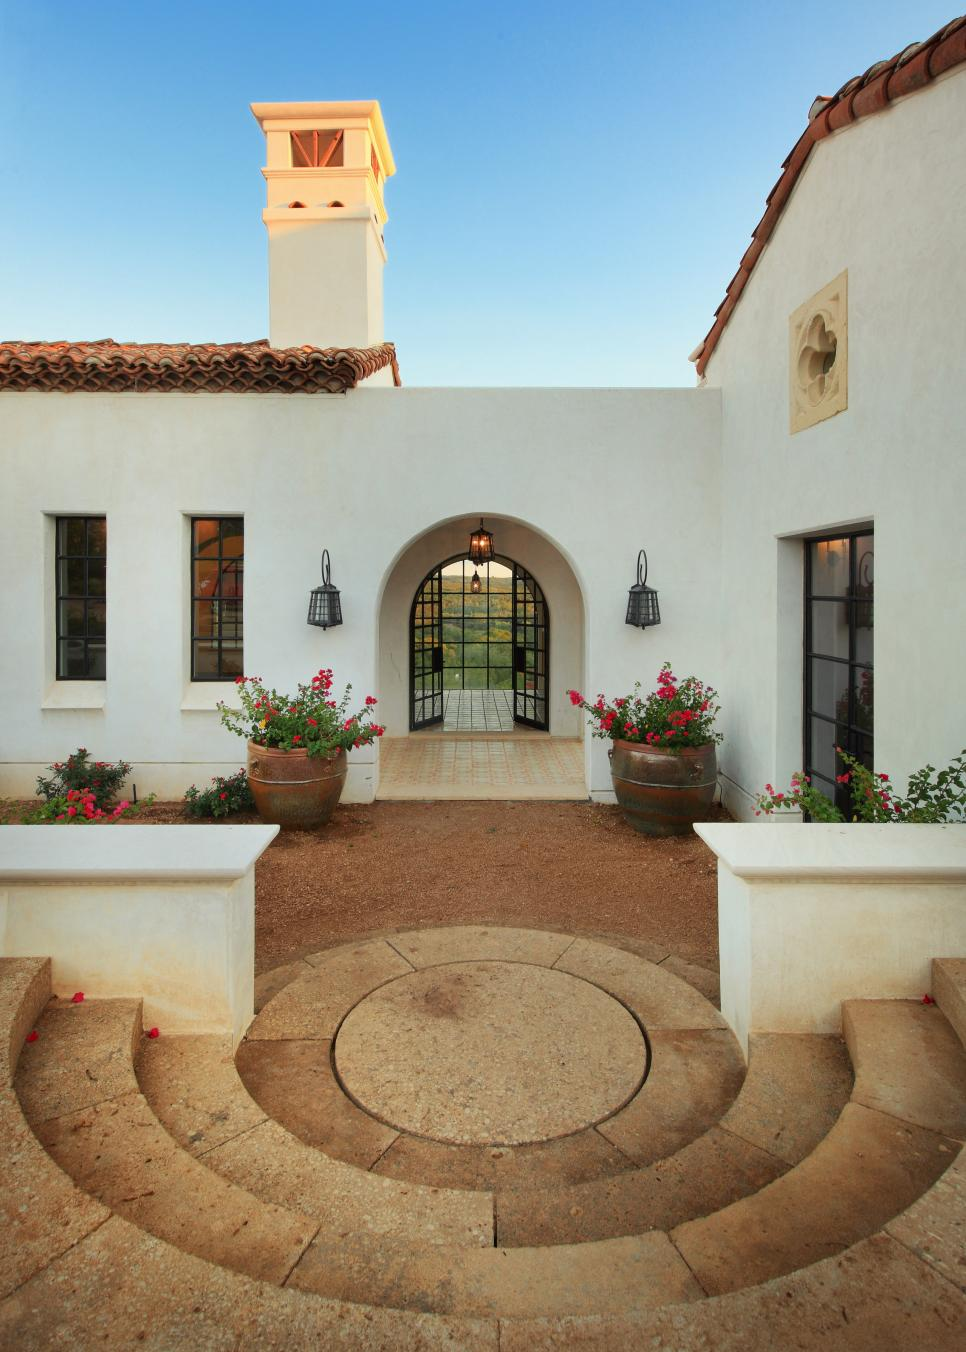 mediterranean style rooms & tips | hgtv